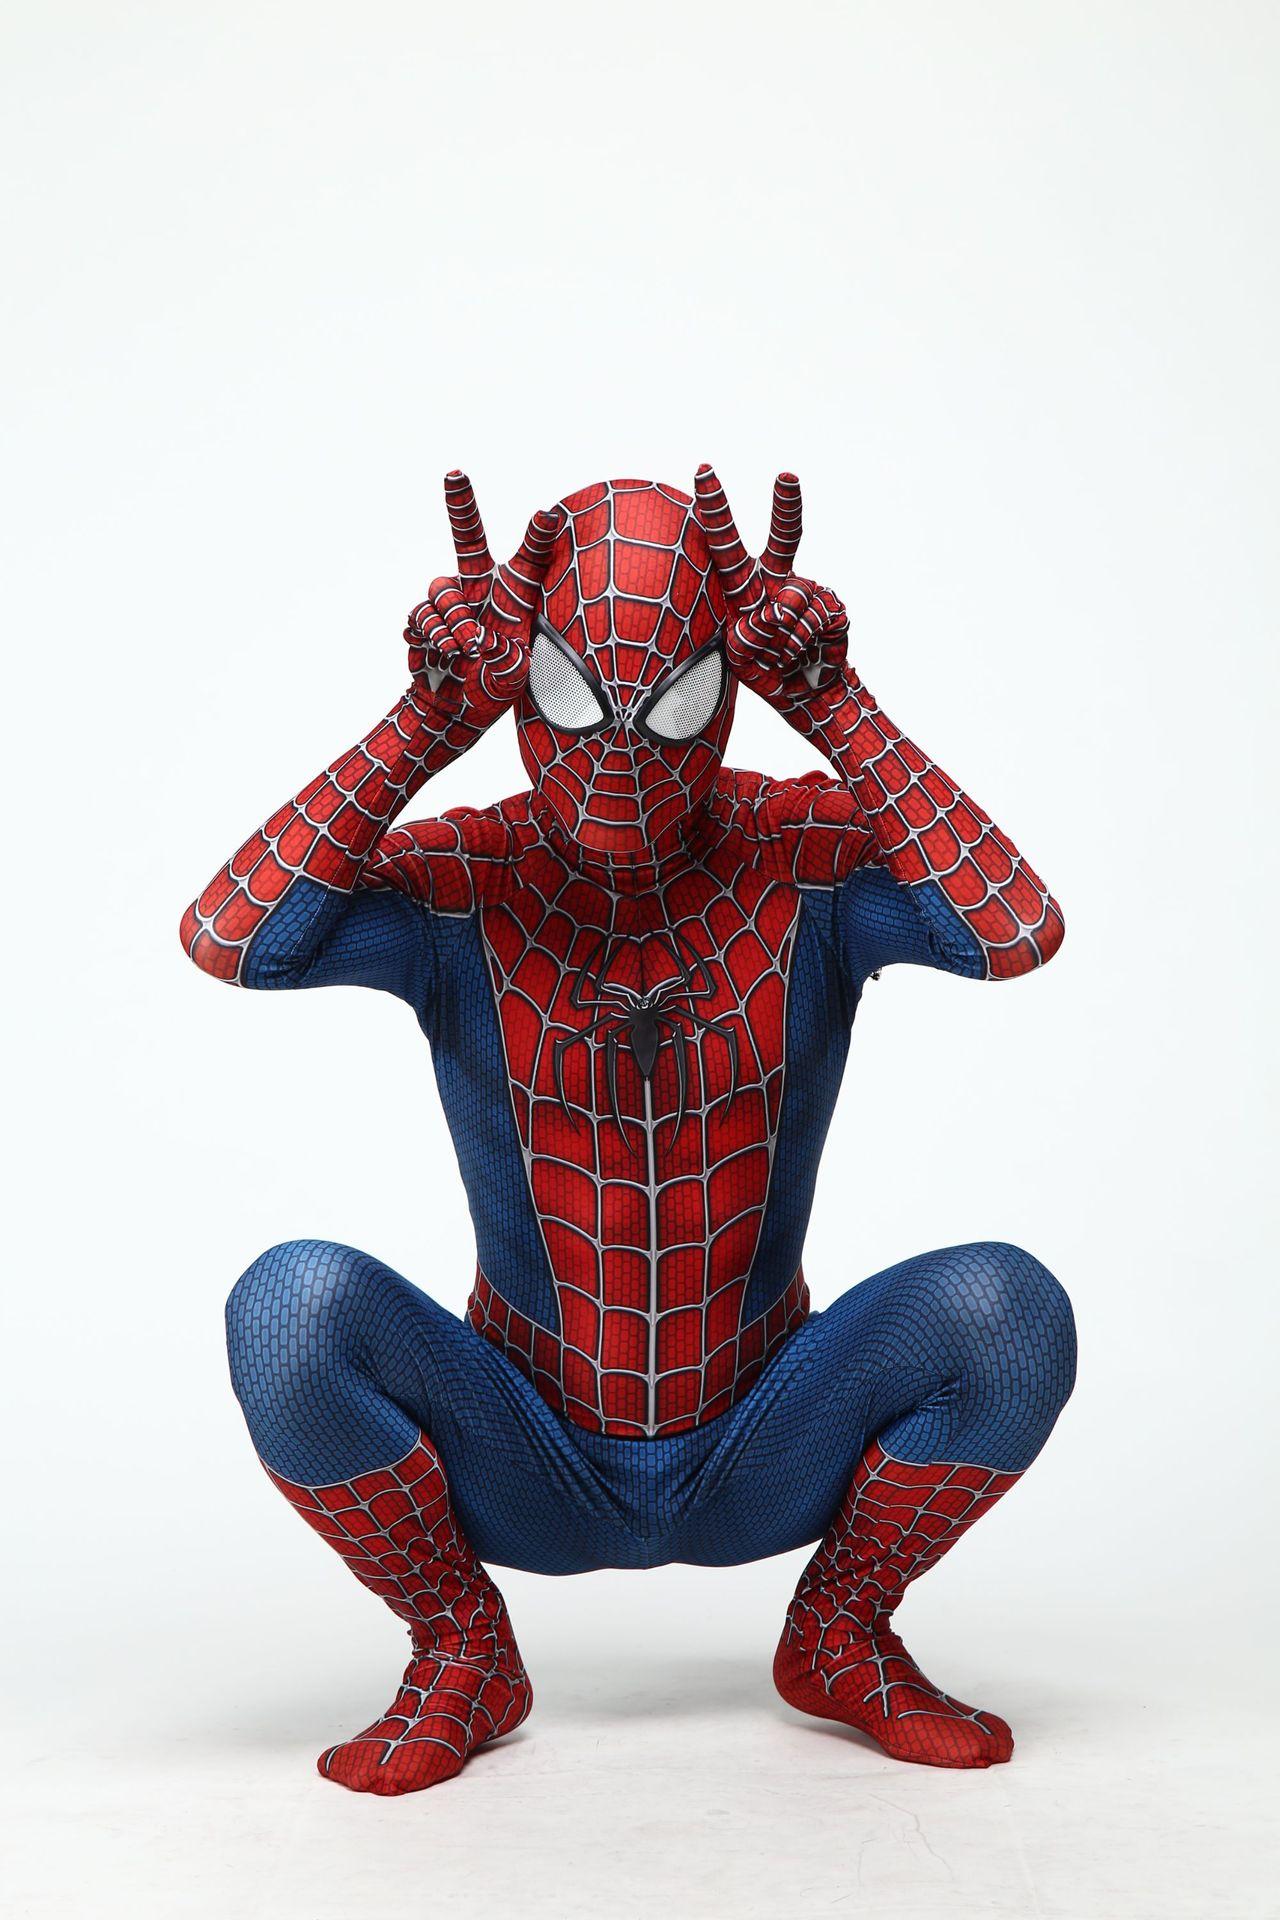 Adult Kids Spider Man 3 Raimi Spiderman Cosplay Costume 3D Print Spandex Zentai Superhero Bodysuit Suit Jumpsuits